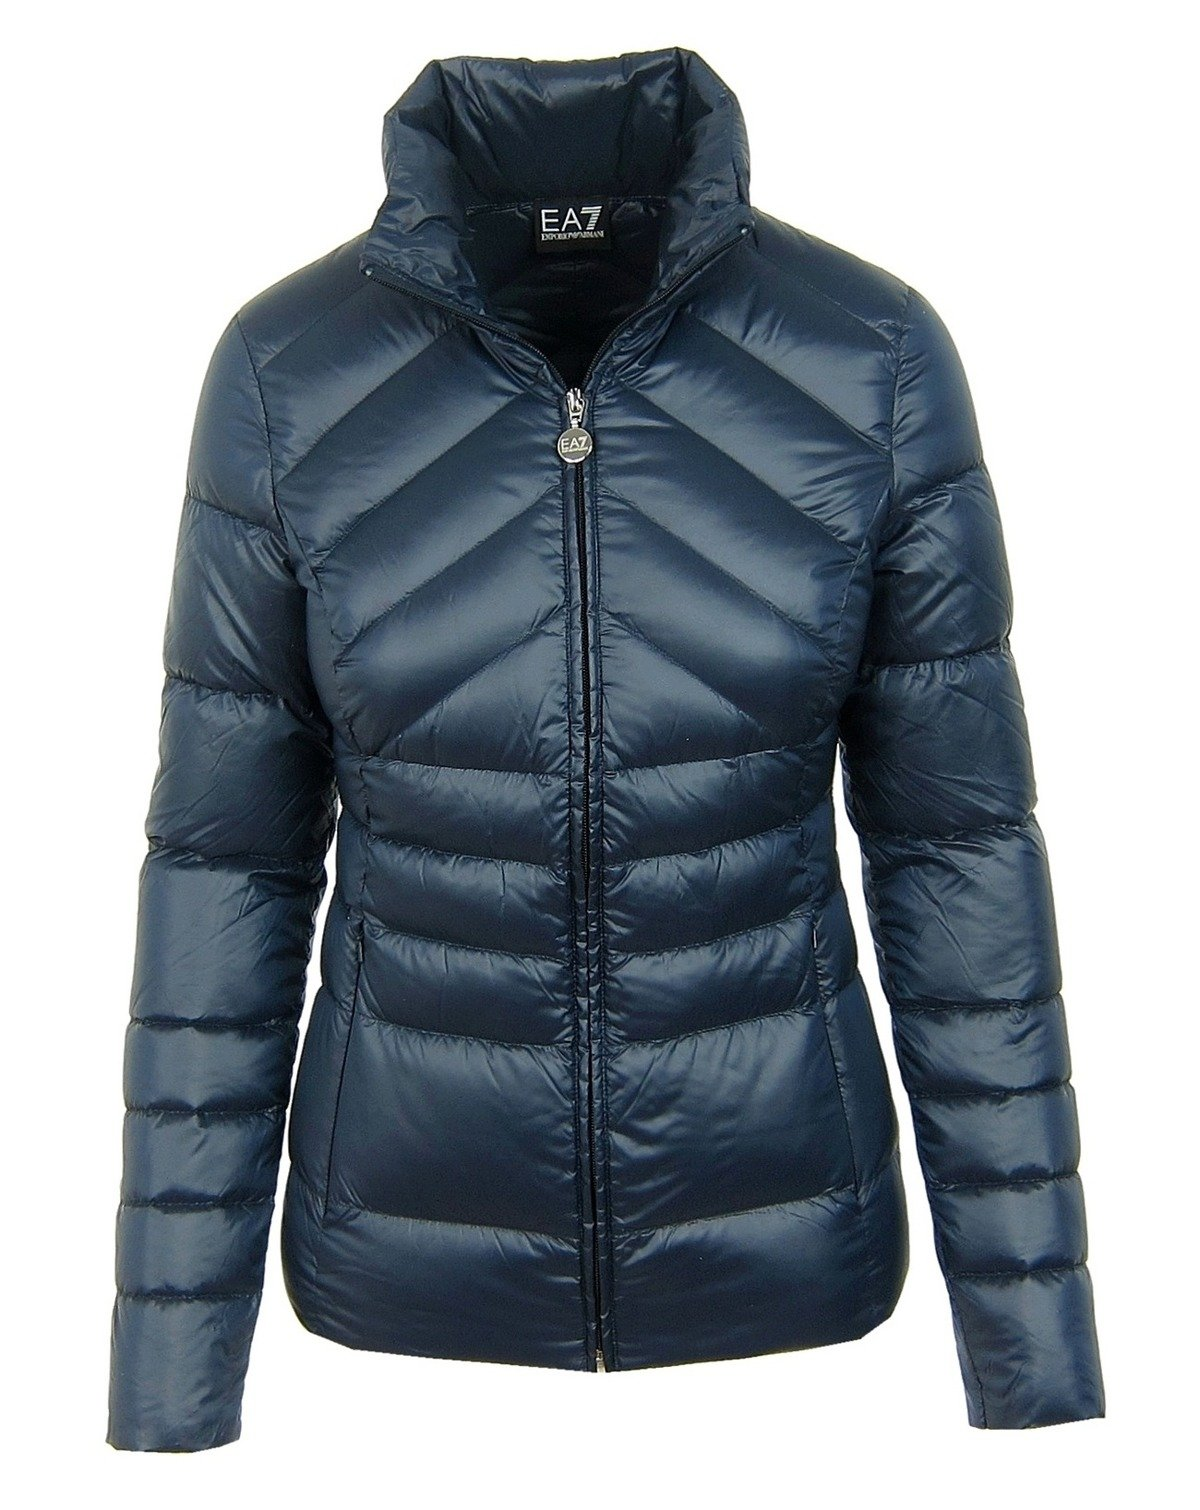 emporio armani ea7 5p245 damen women daunenjacke down jacket dunkelblau navy ebay. Black Bedroom Furniture Sets. Home Design Ideas